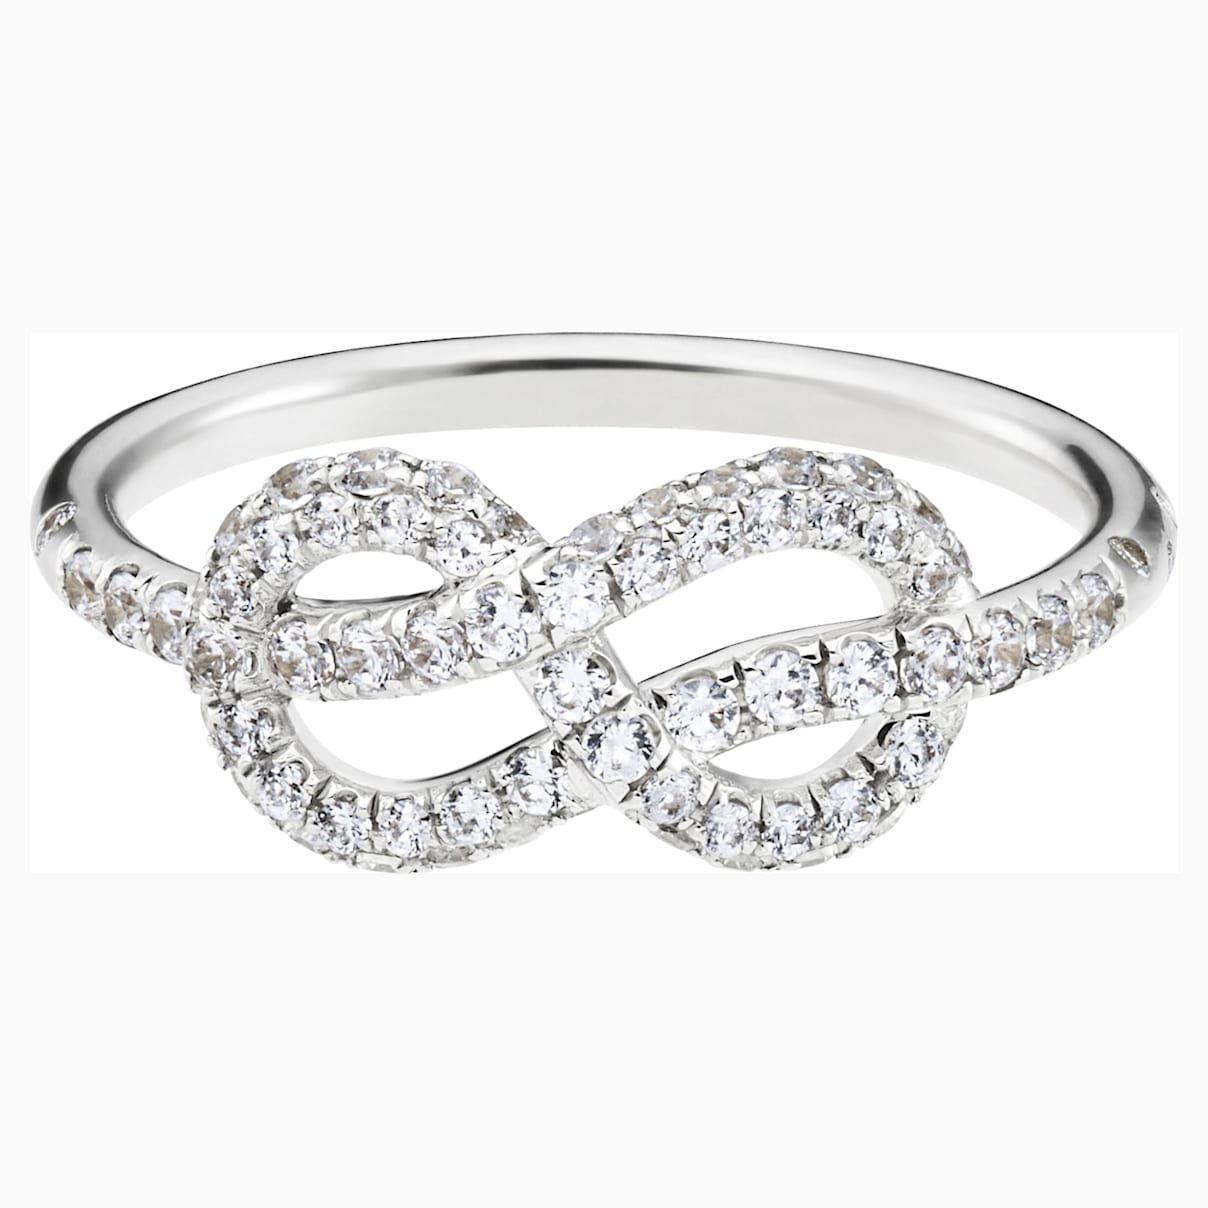 Knot of True Love Classic Pavé Ring, Swarovski Created Diamonds, 18K White Gold, Size 58